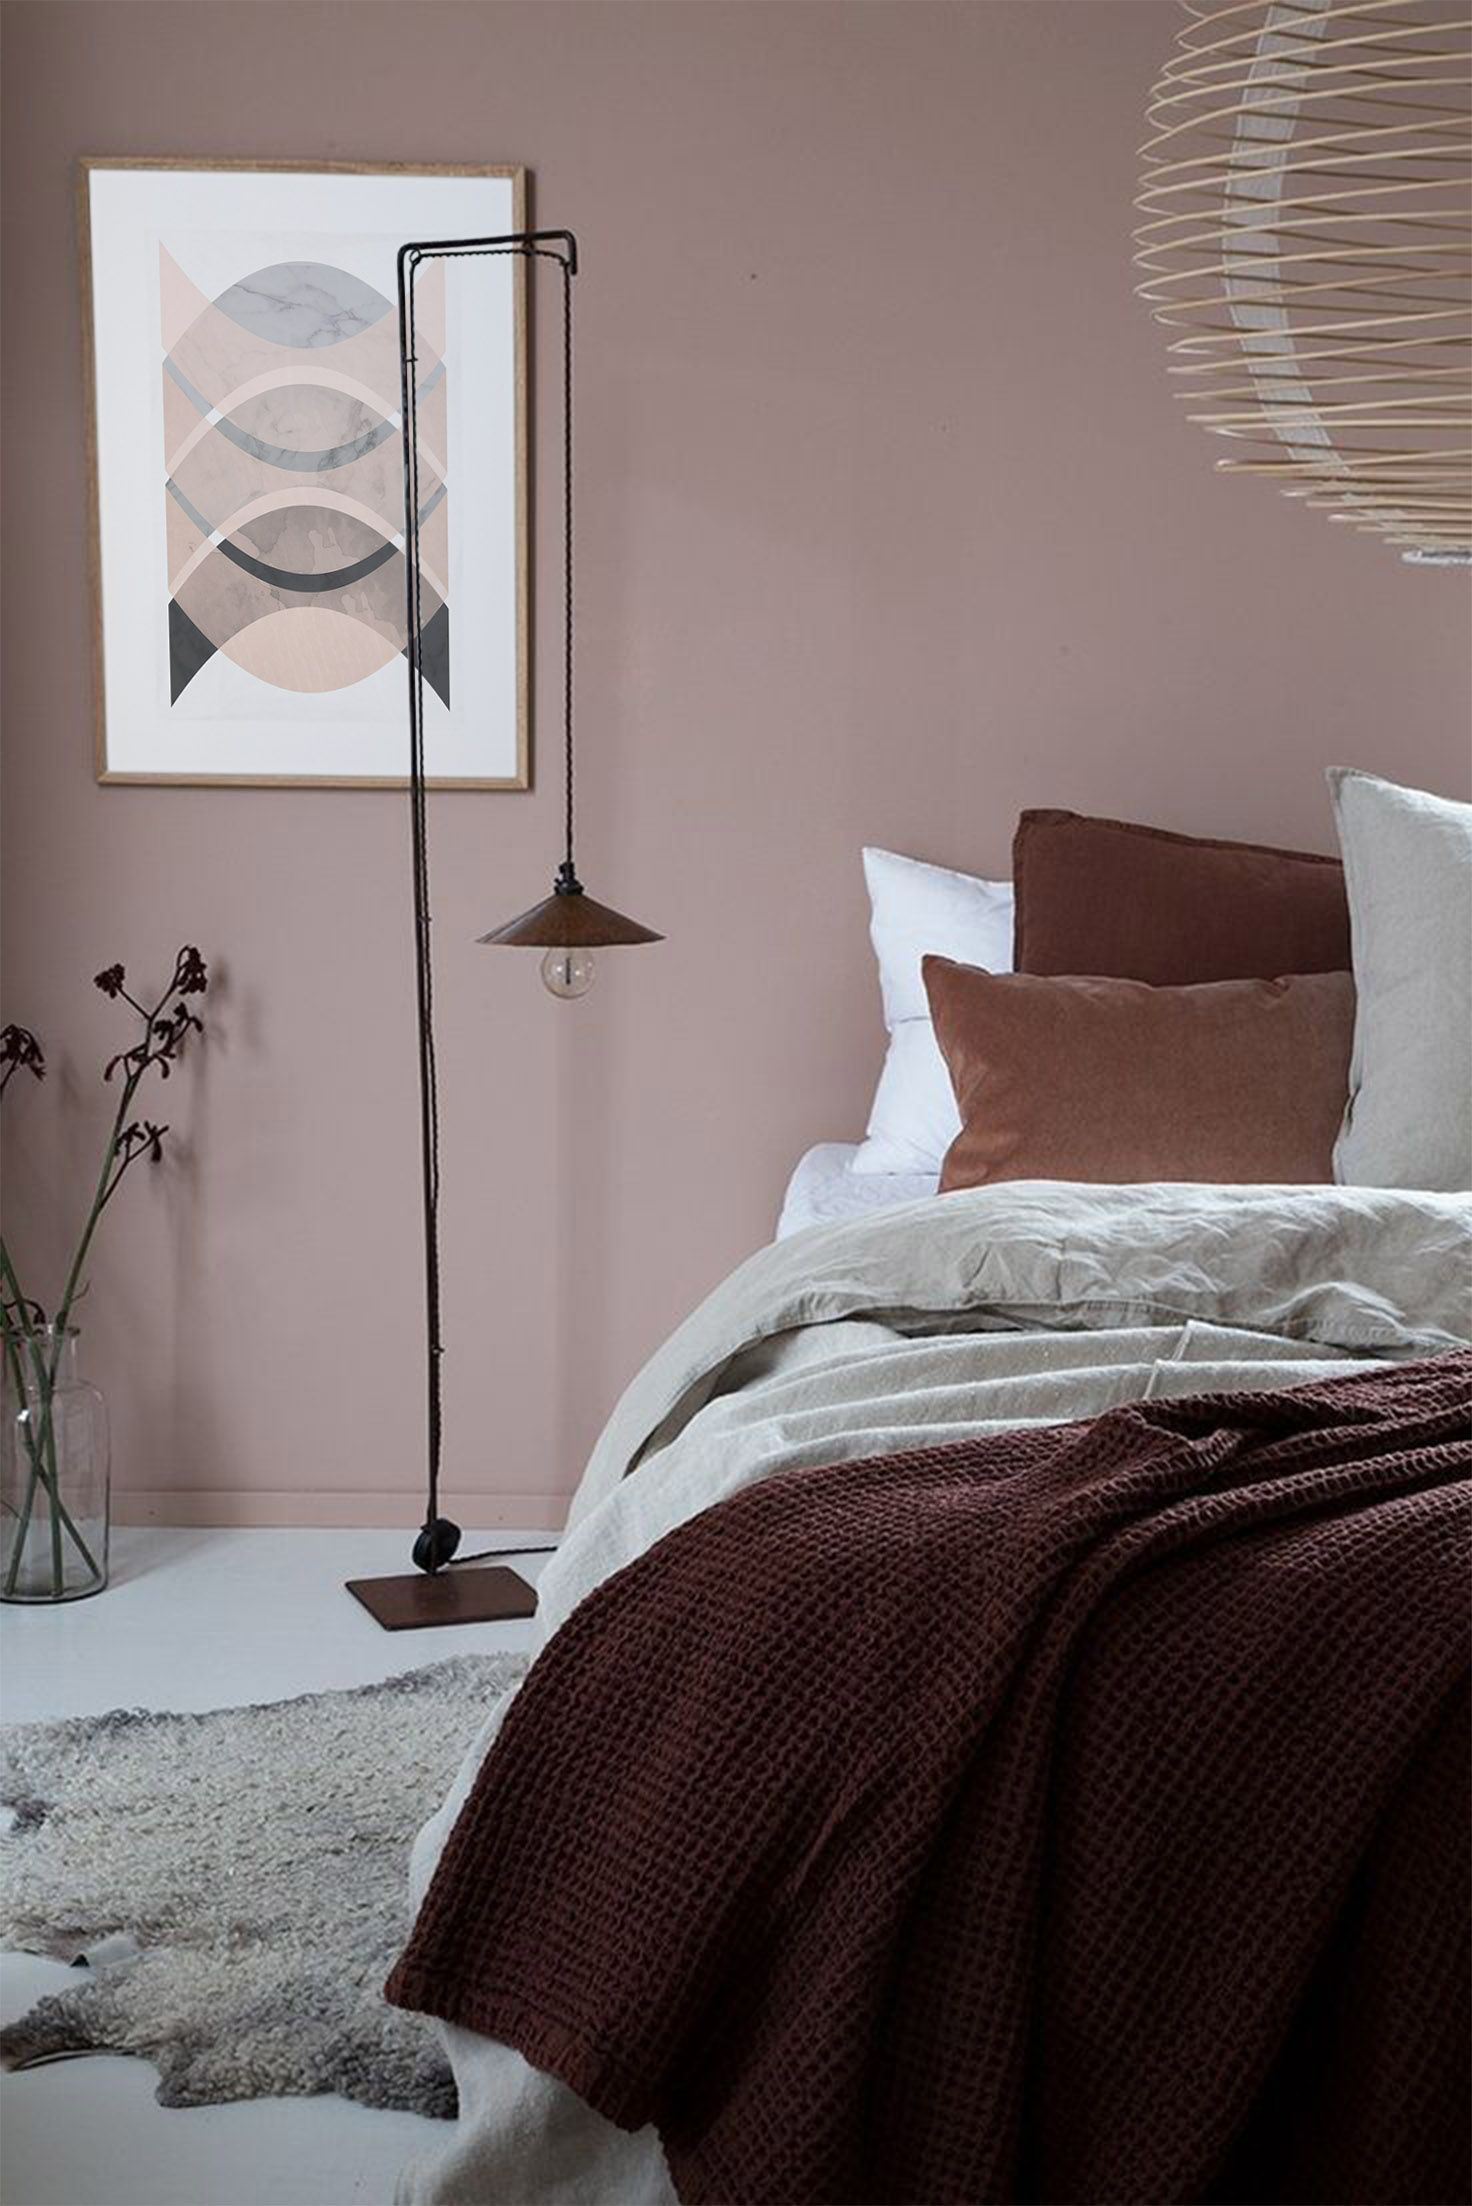 Minimalist Art Print Pink And Grey Print Abstract Prints Wall Decor Home Decor Geometric Design Modern Art Print Minimalist Art Print Dusty Pink Bedroom Pink Bedroom Walls Home Bedroom